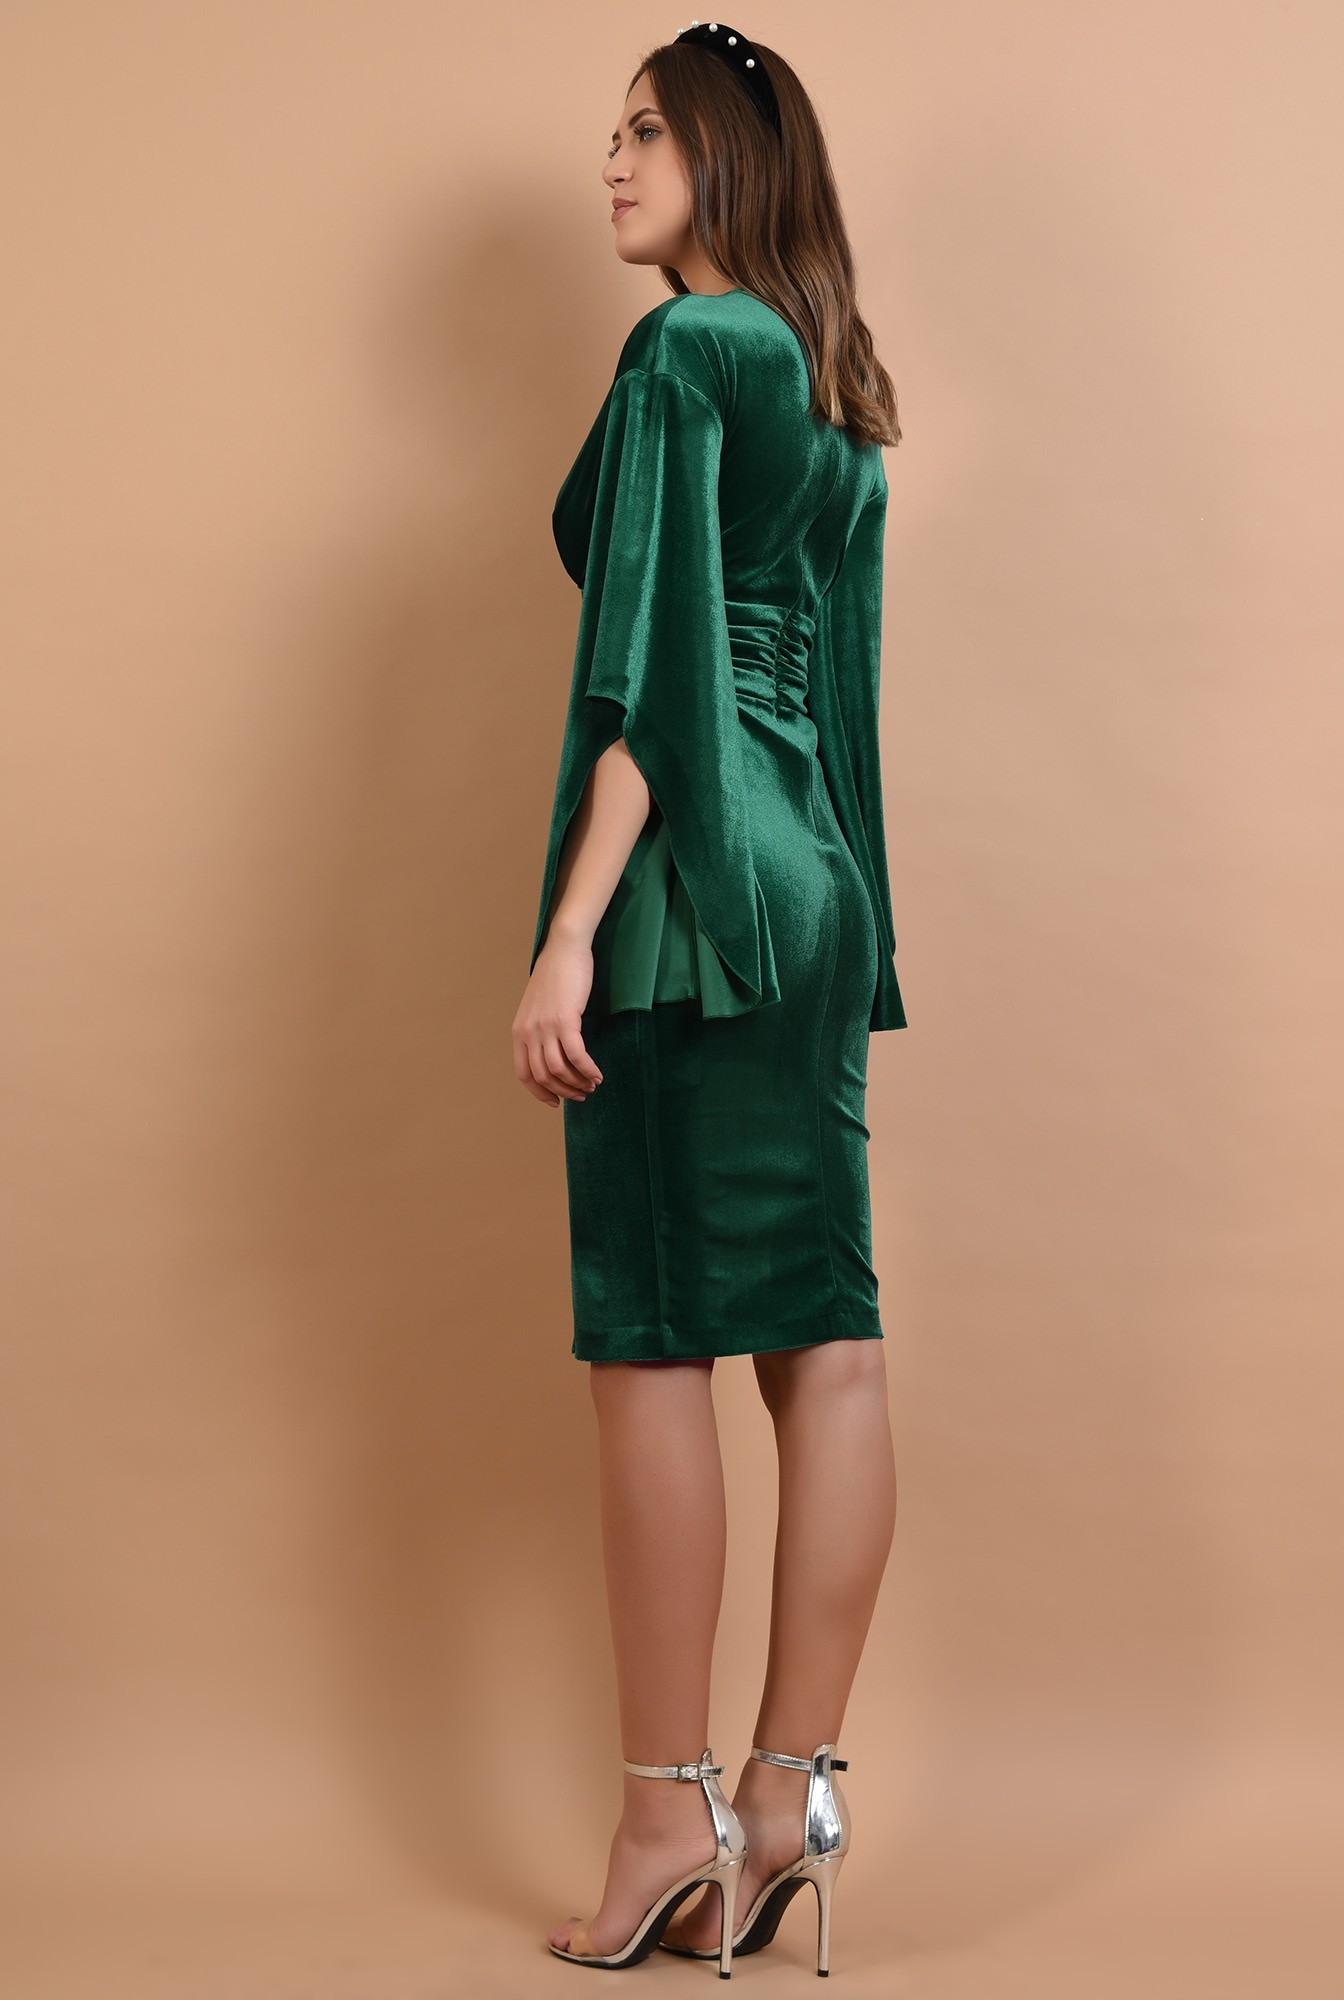 1 - rochie de seara, brau fronsat, maneci liliac, anchior